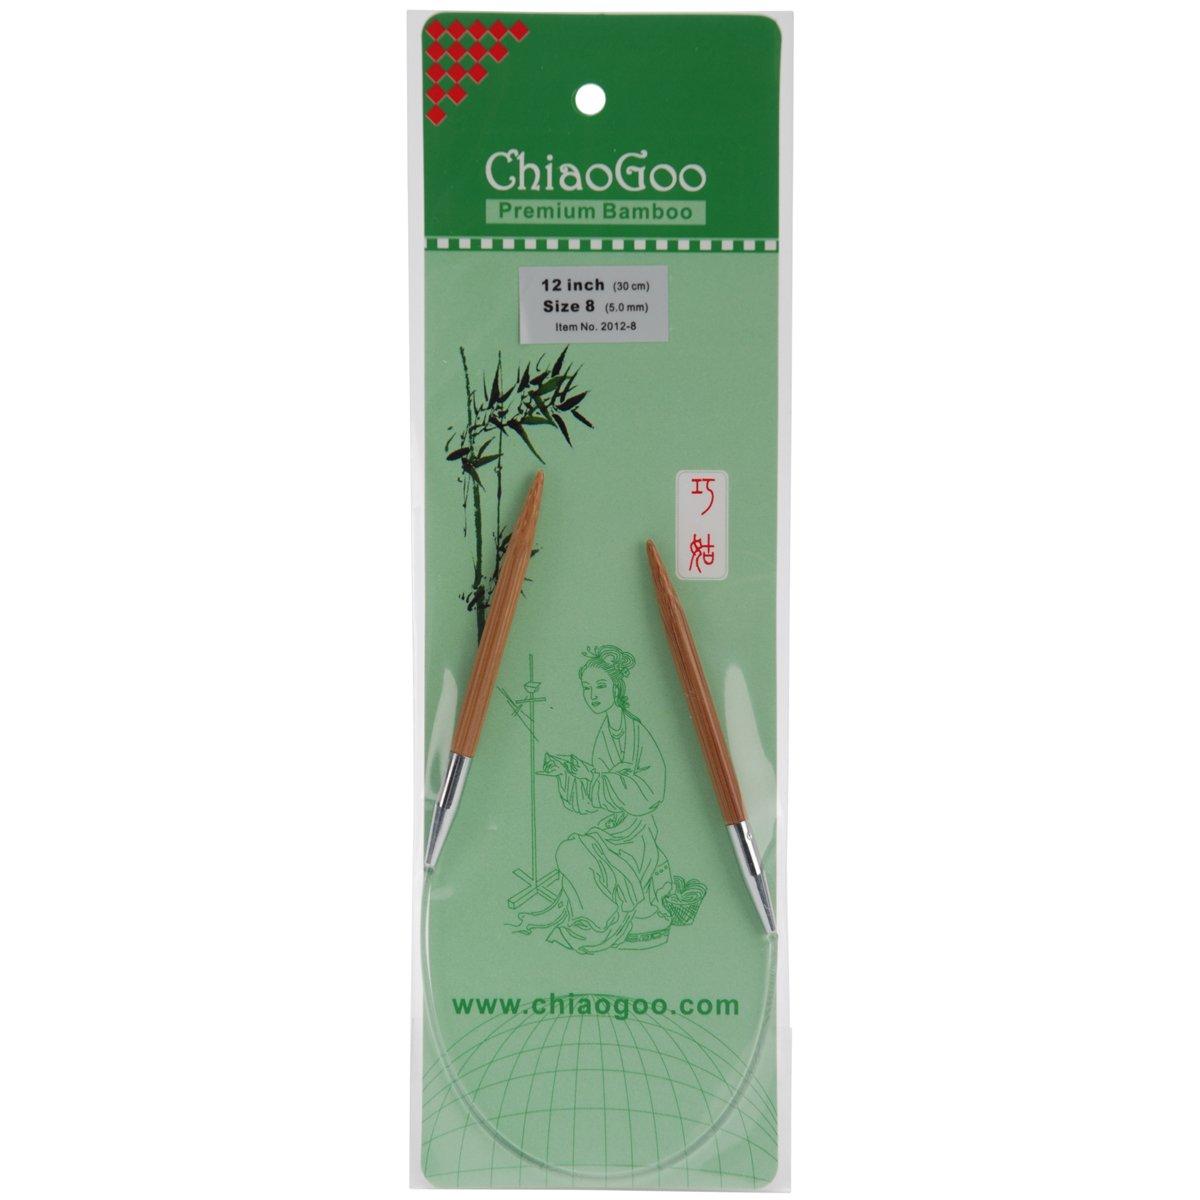 5mm ChiaoGoo 2012-8 Circular 12-Inch Bamboo Dark Patina Knitting Needle